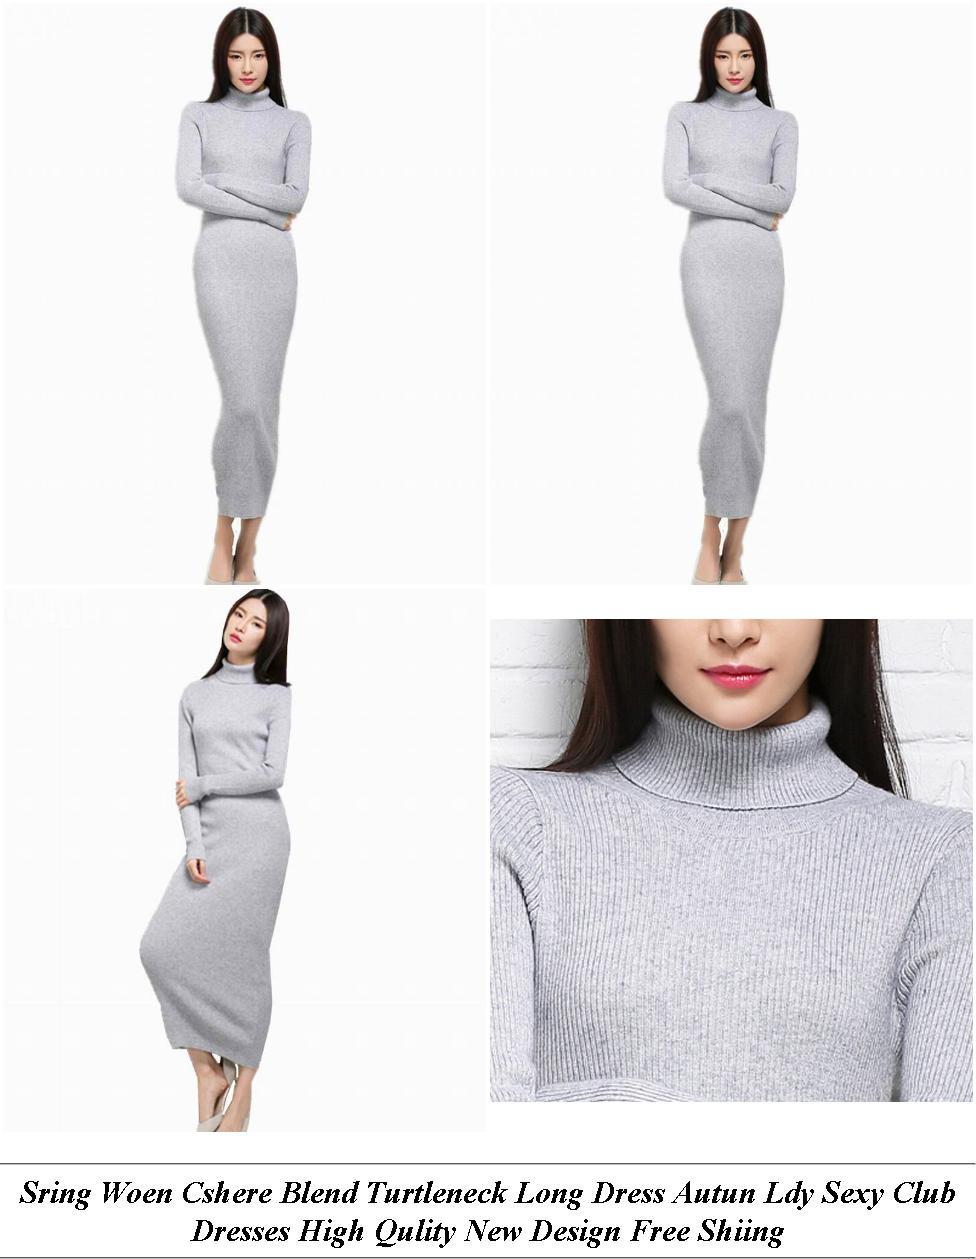 Formal Dresses For Women - 70 Off Sale - Midi Dress - Cheap Designer Clothes Womens